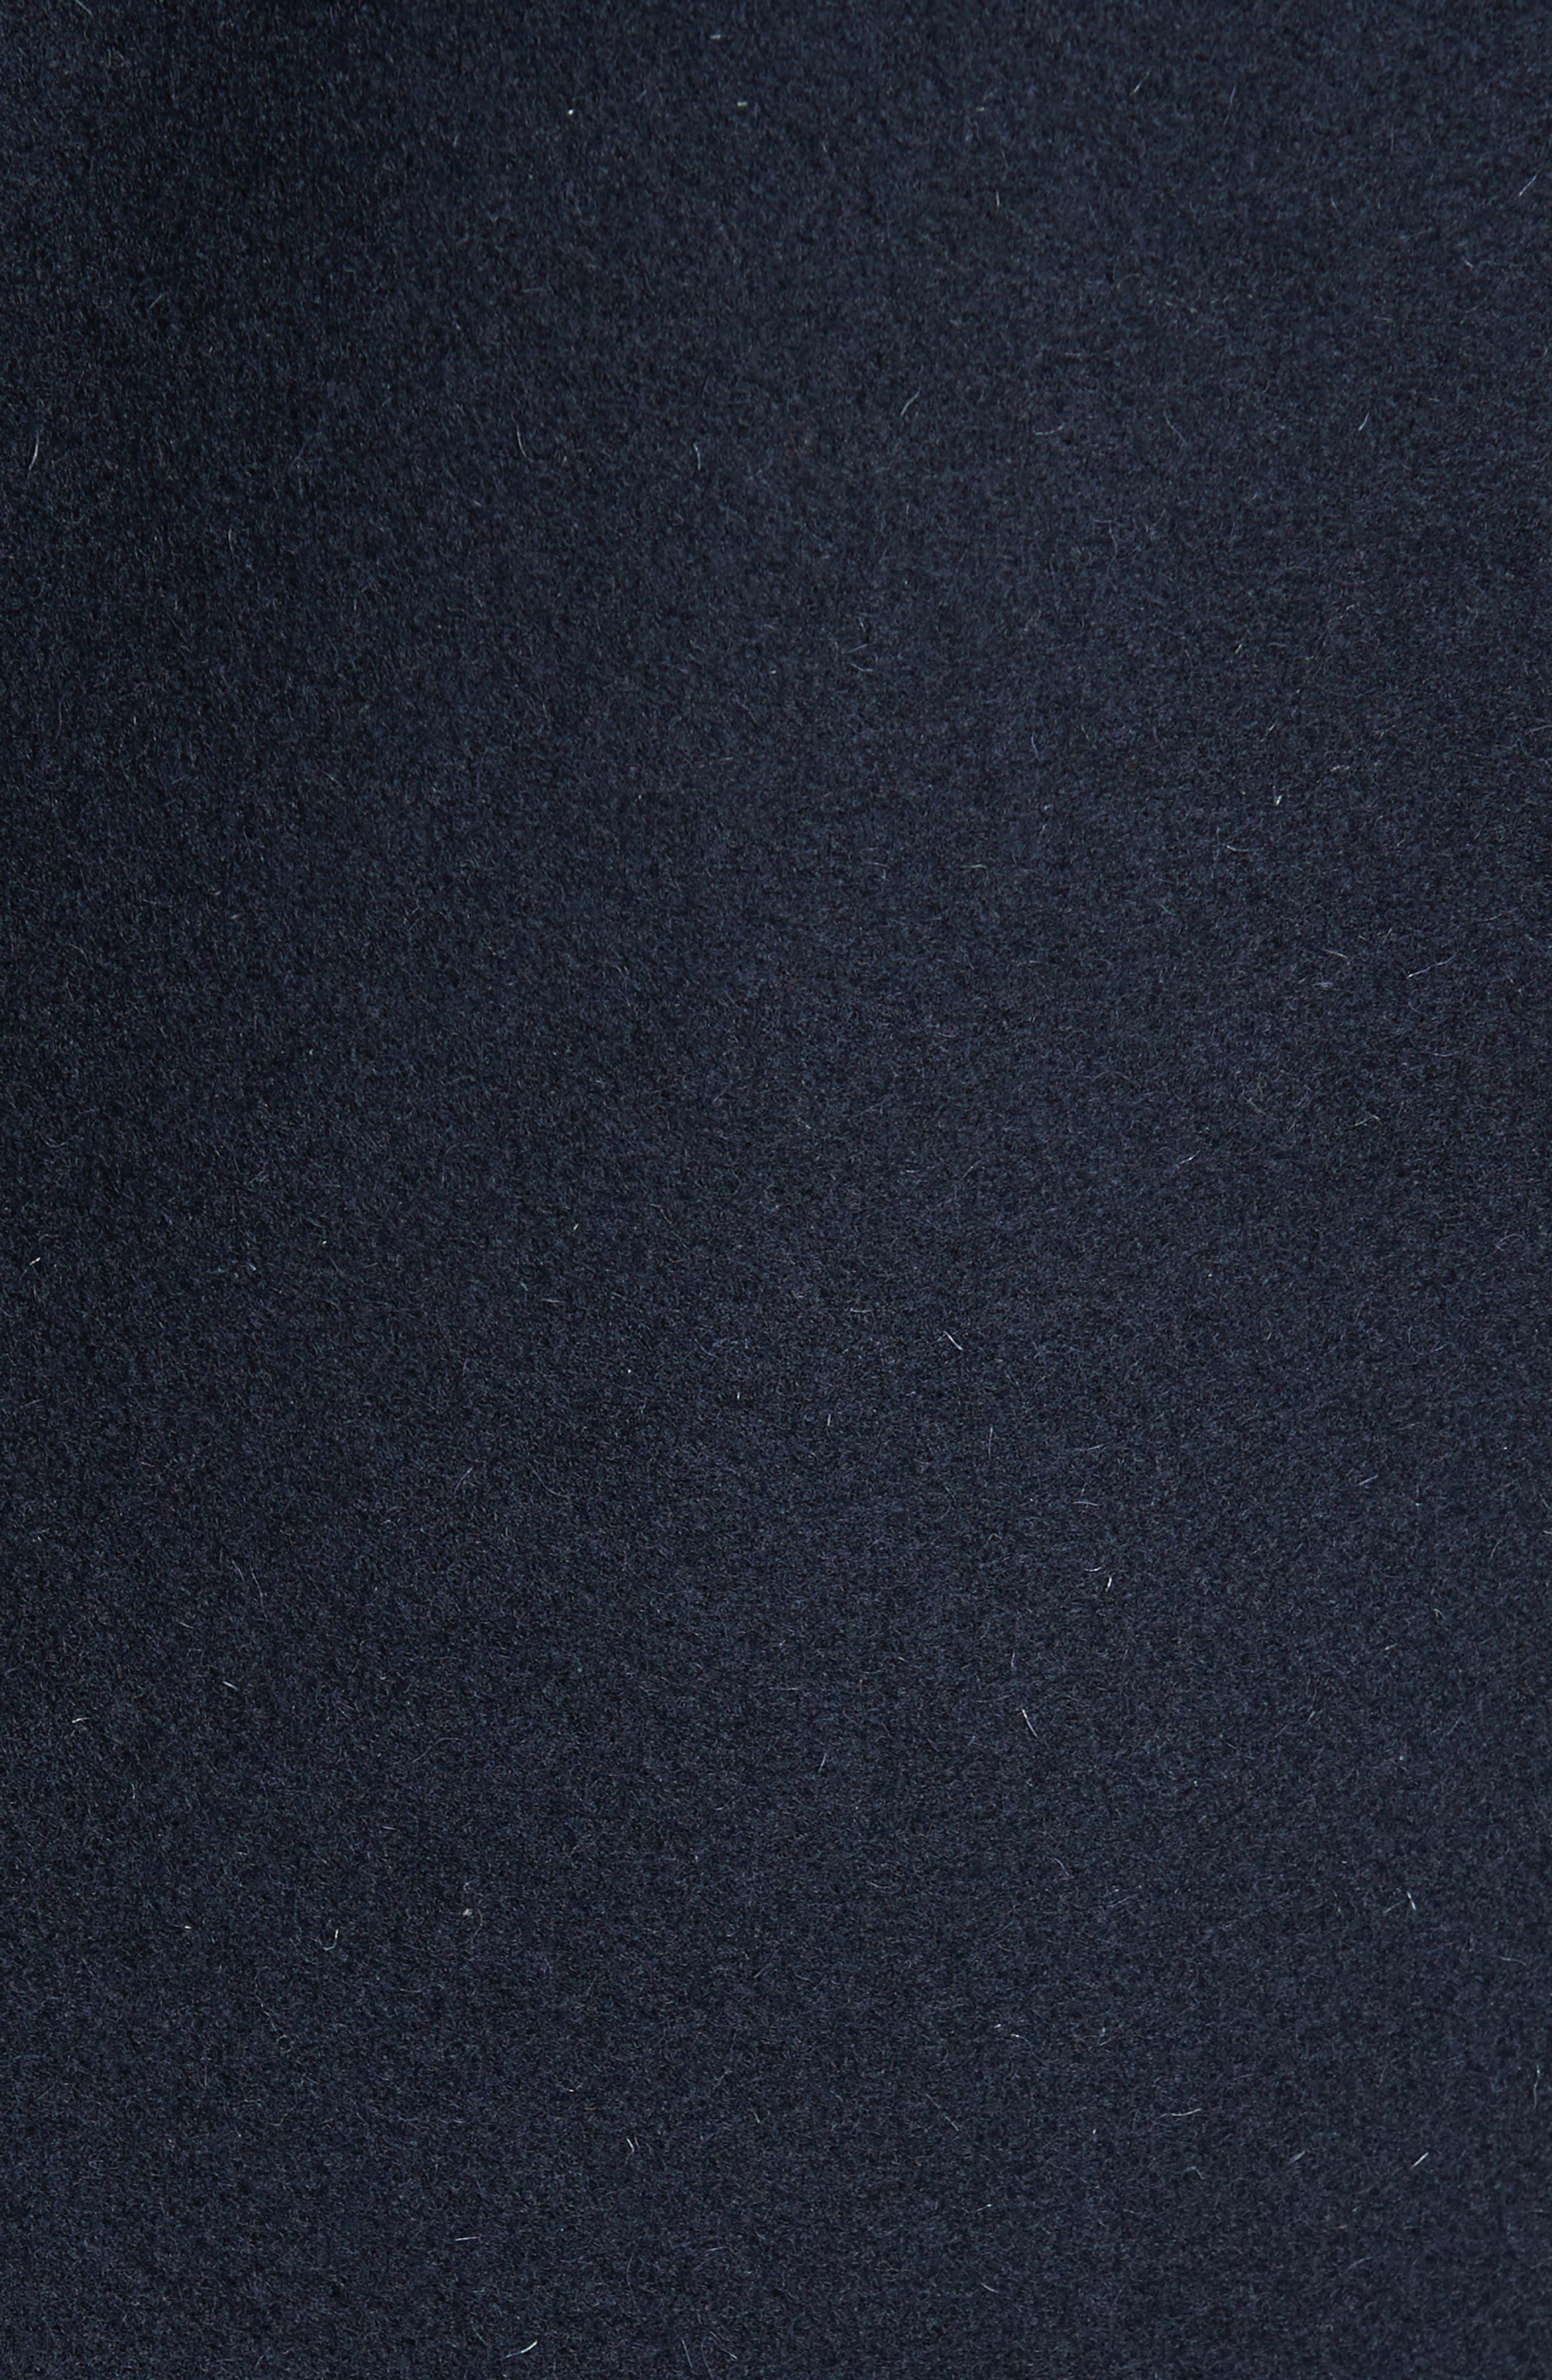 Woodall Wool Blend Blazer,                             Alternate thumbnail 6, color,                             001